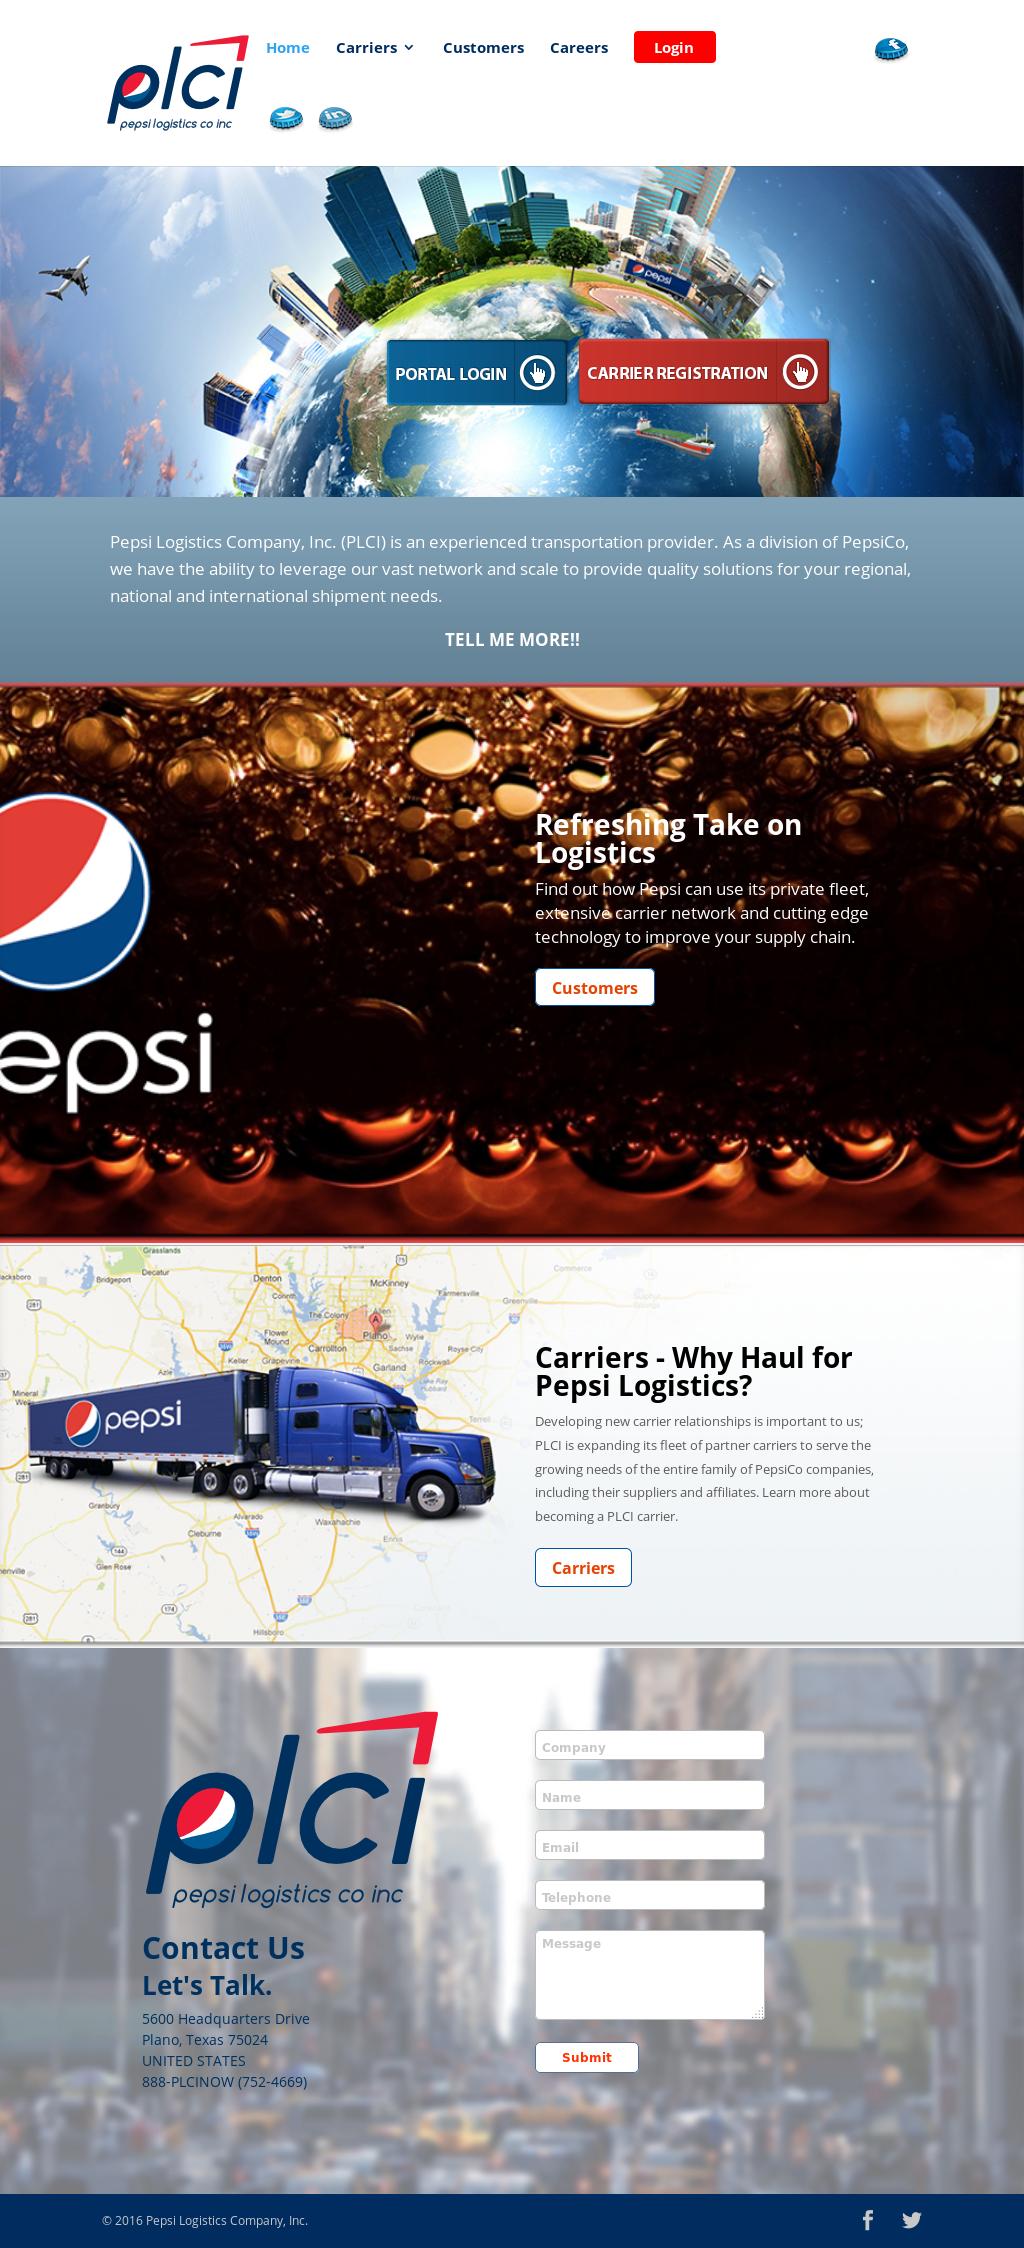 Pepsi Logistics Company Competitors, Revenue and Employees